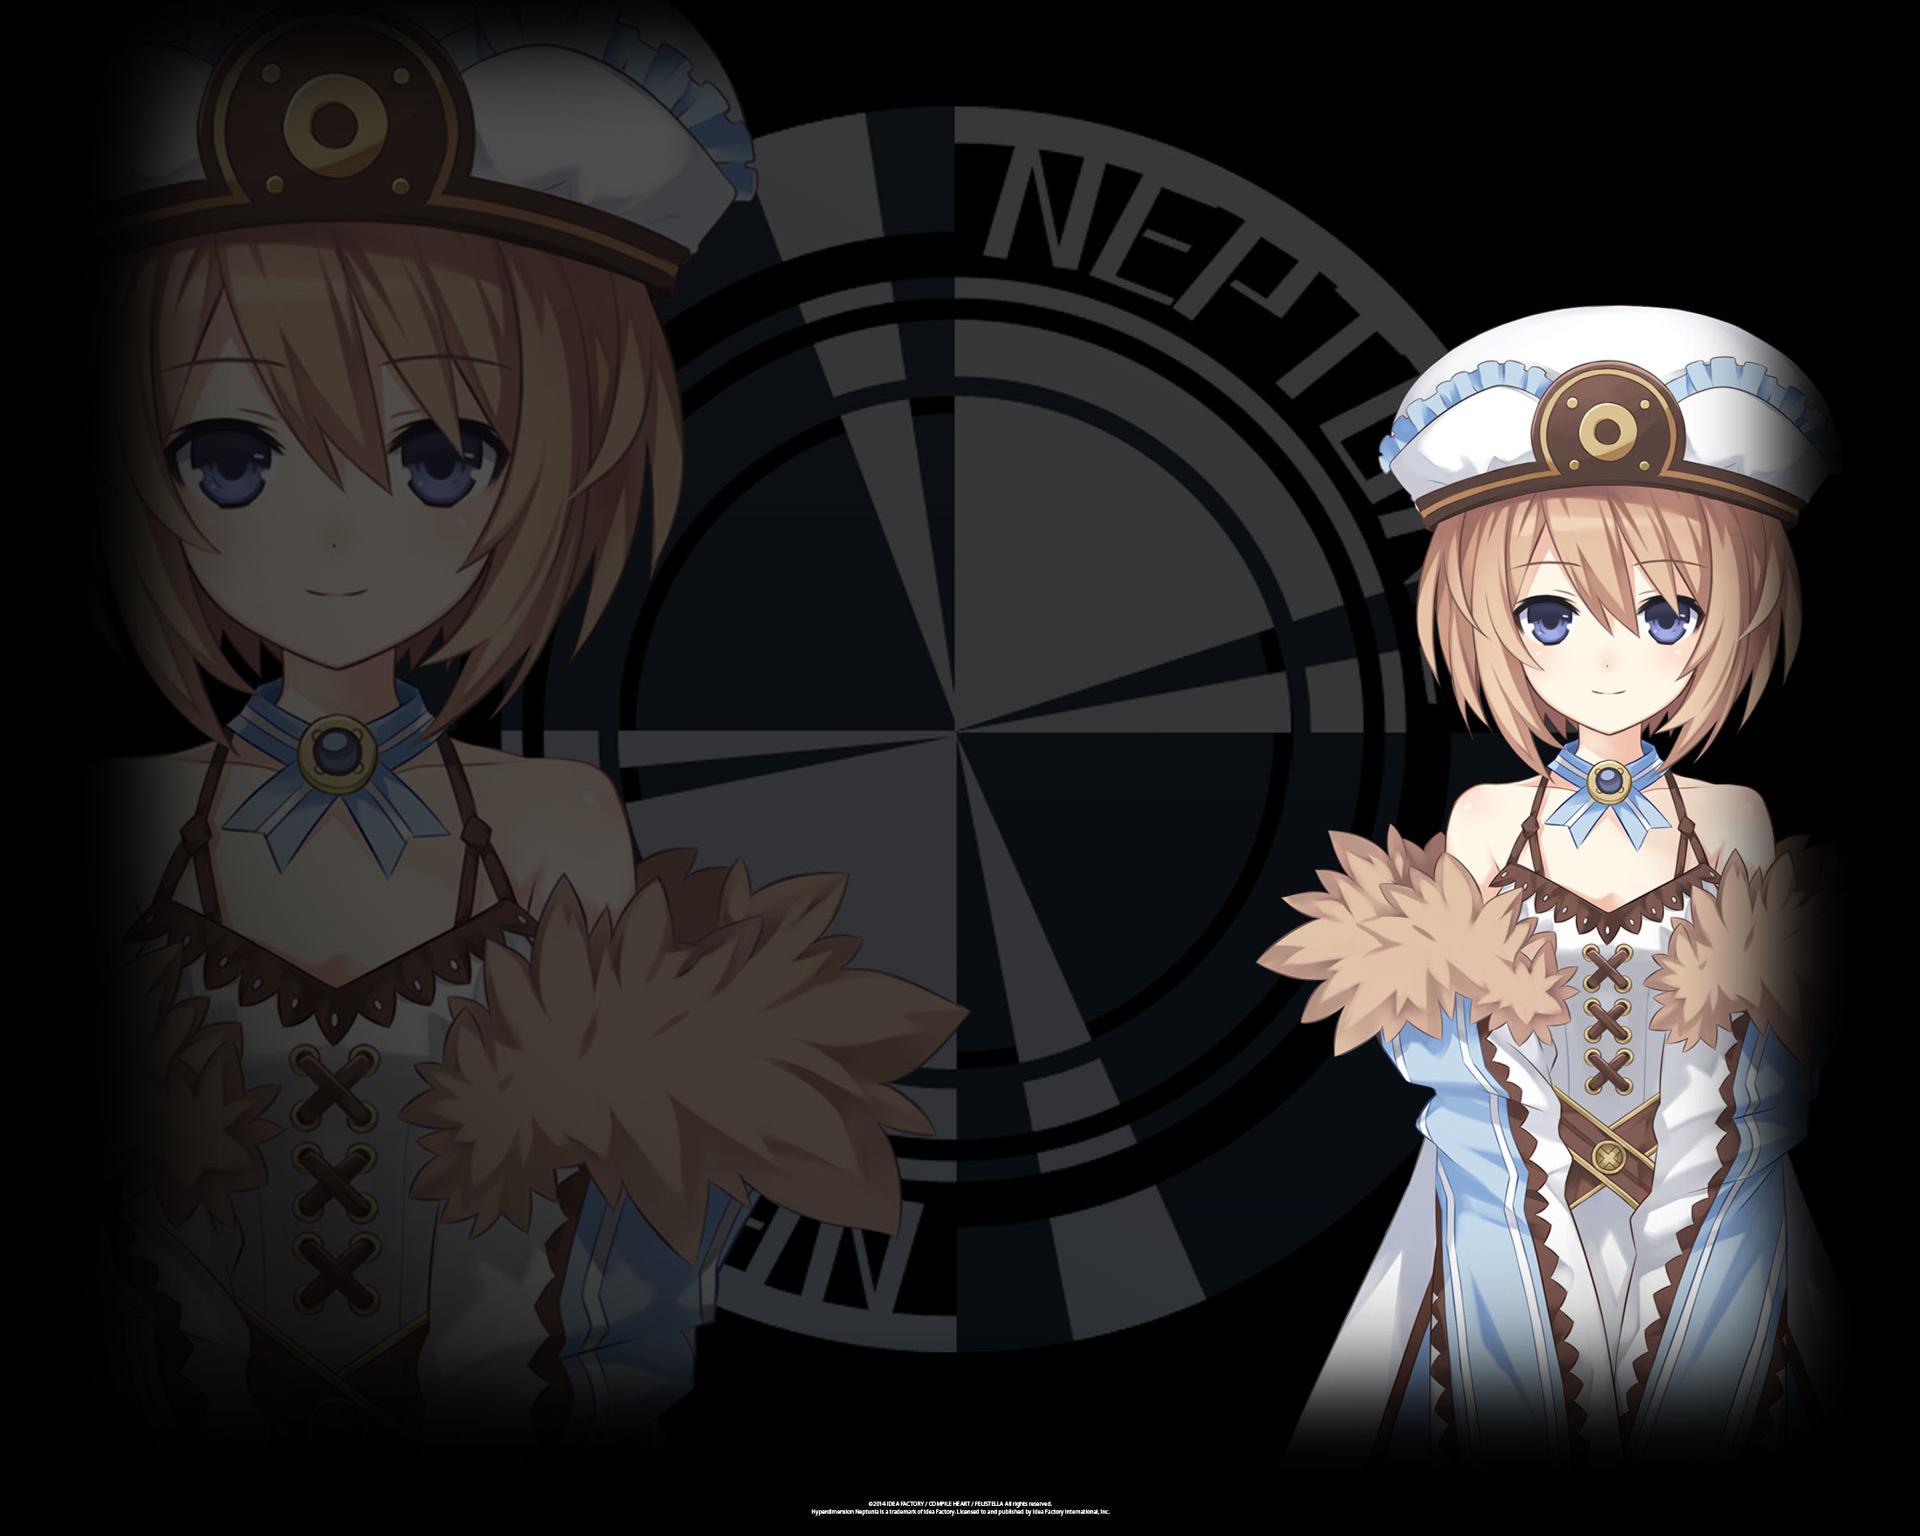 Hyperdimension Neptunia ReBirth 1 Wallpaper 003 Blanc